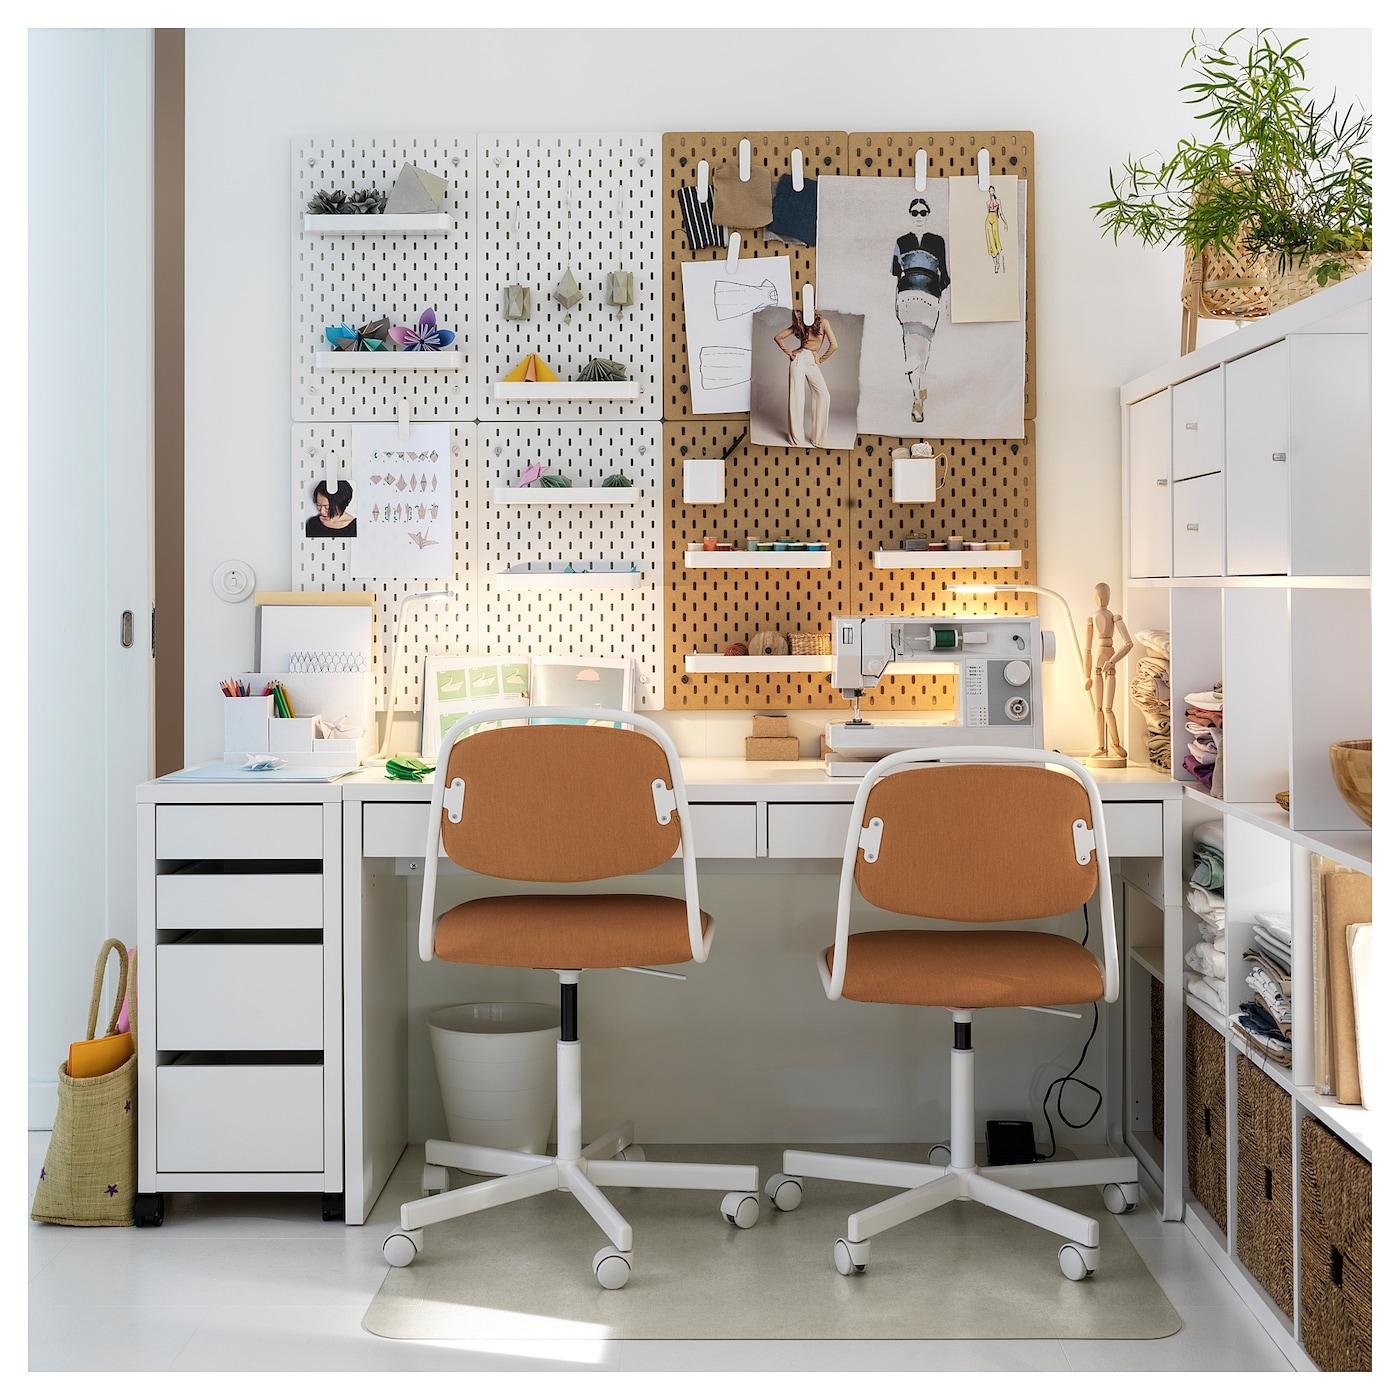 MICKE Skrivbord, svartbrun, 142x50 cm IKEA